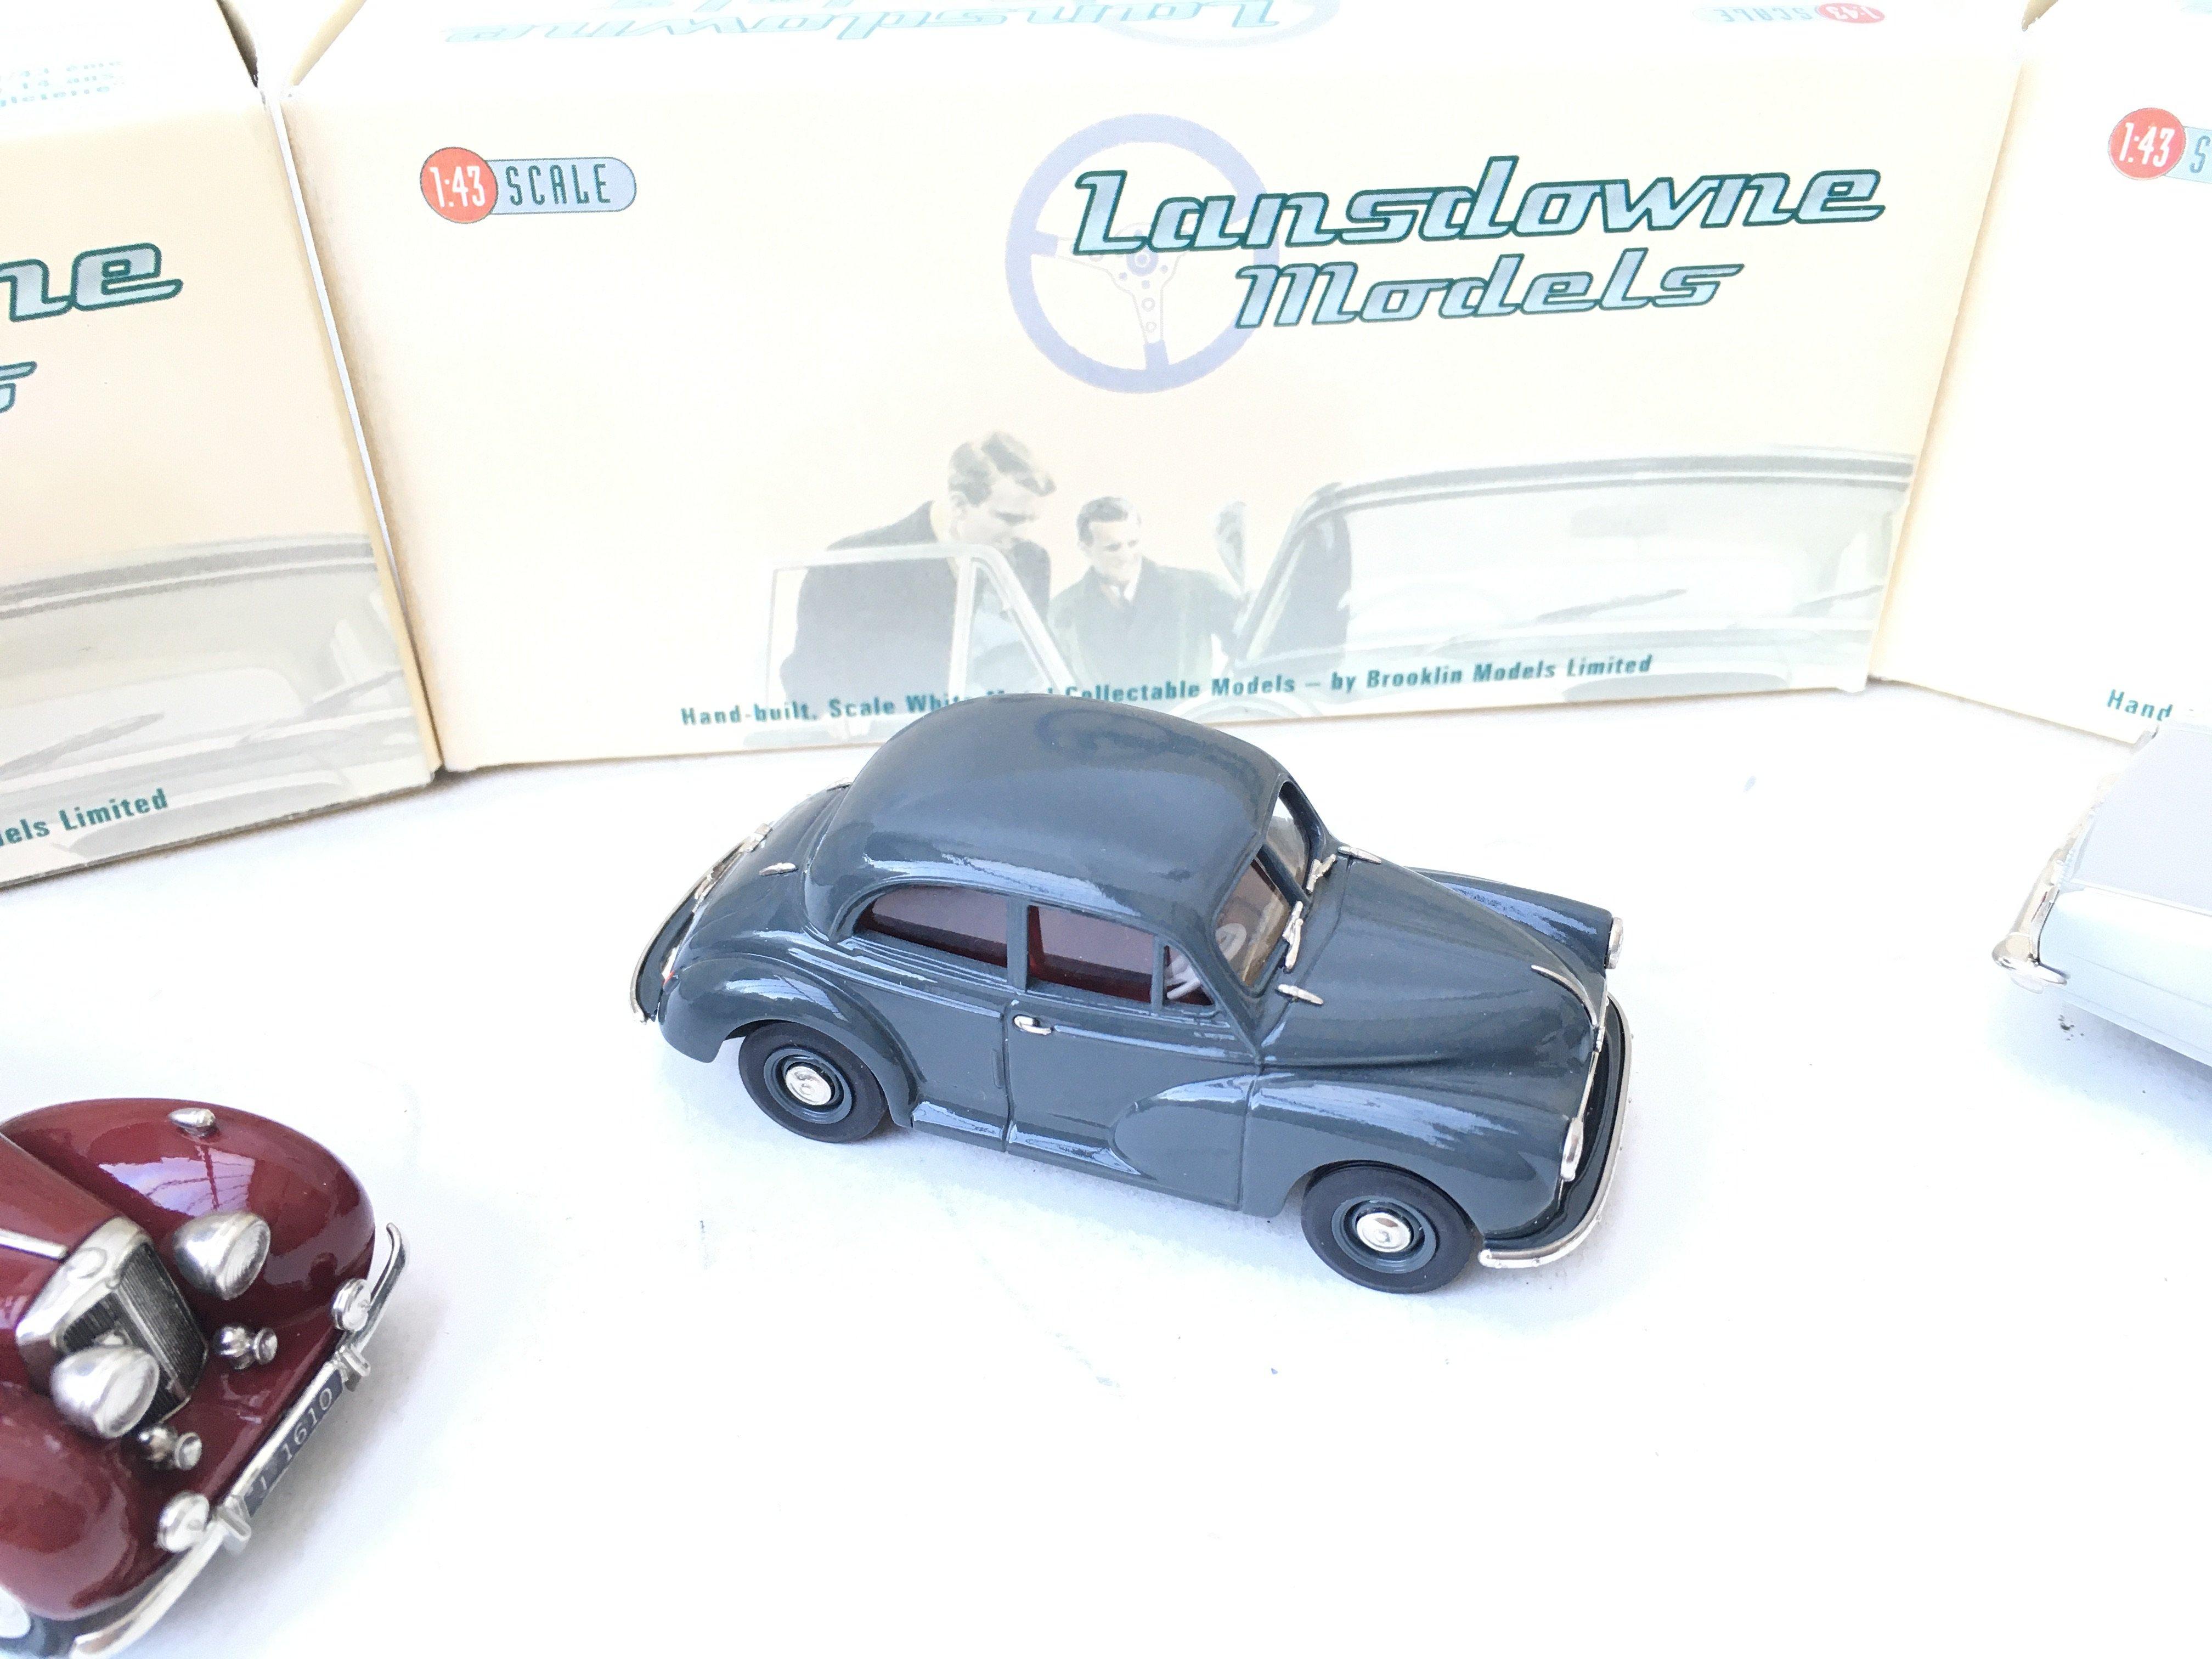 3 X Lansdowne Models including LDM 36 1952 Morris Minor Series II. LDM 37 1949 Triumph 2000 Roadster - Image 3 of 4